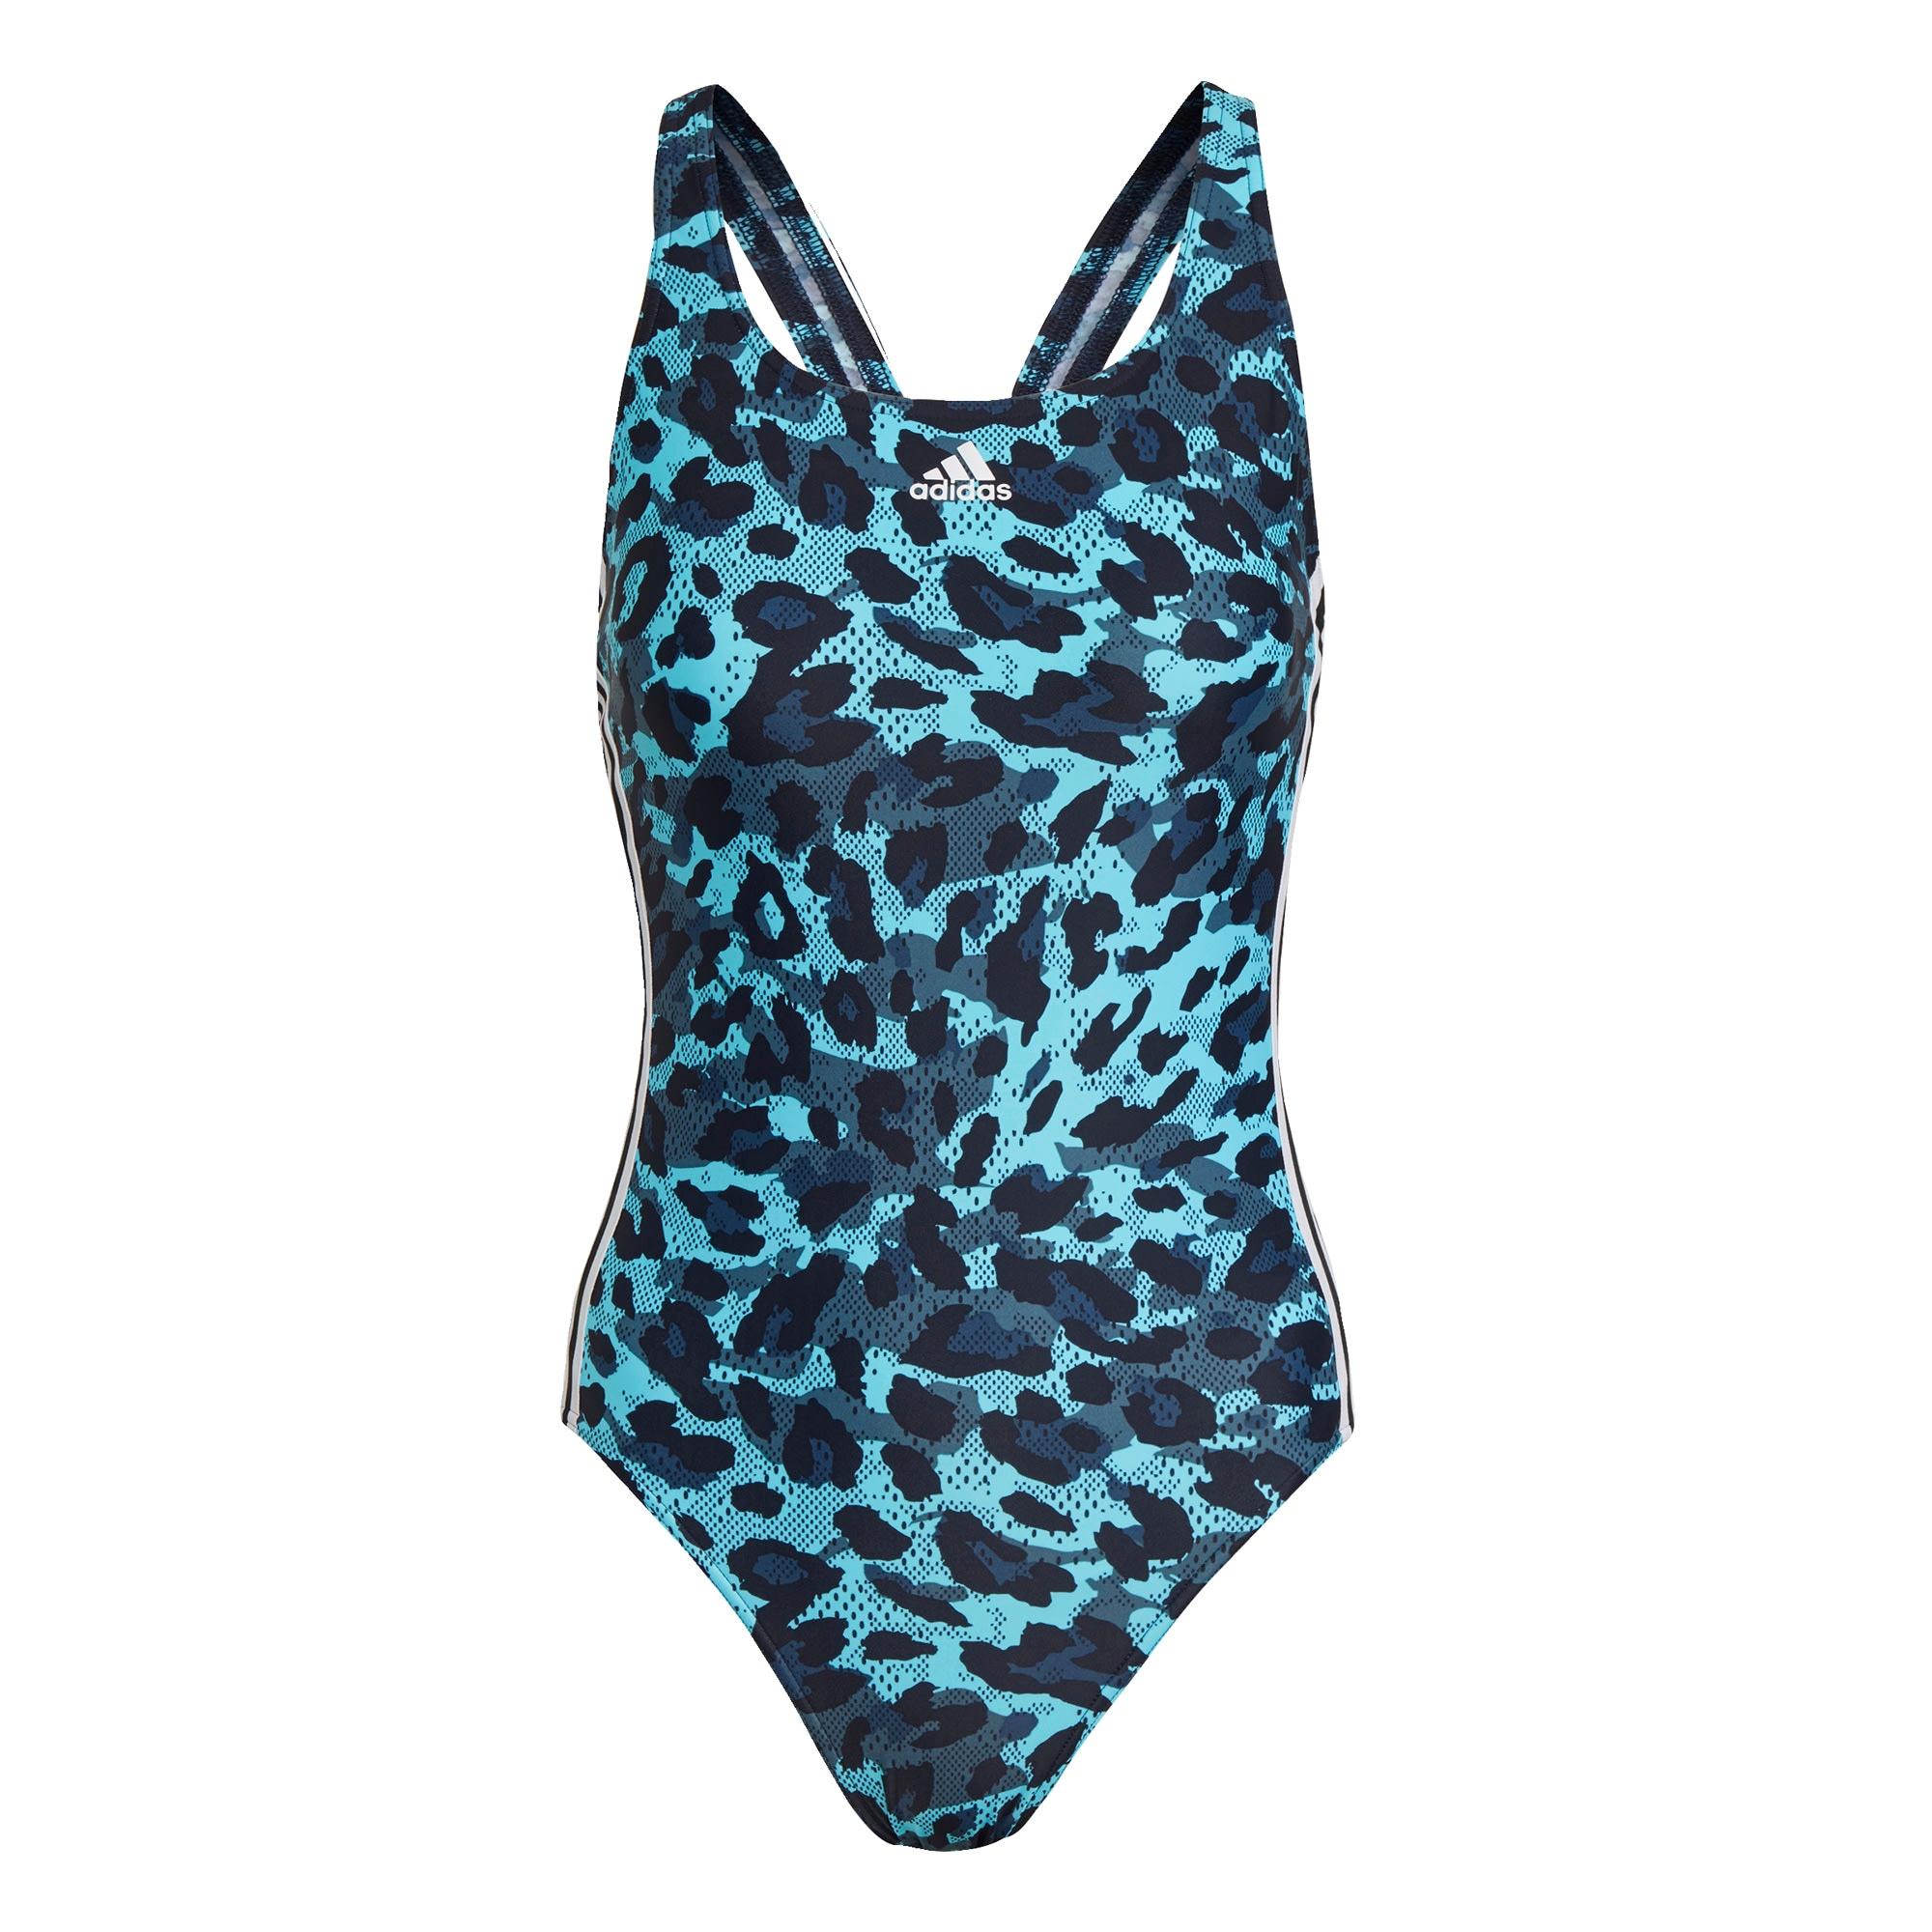 ADIDAS PERFORMANCE Sportovní plavky  aqua modrá / bílá / chladná modrá / tmavě modrá